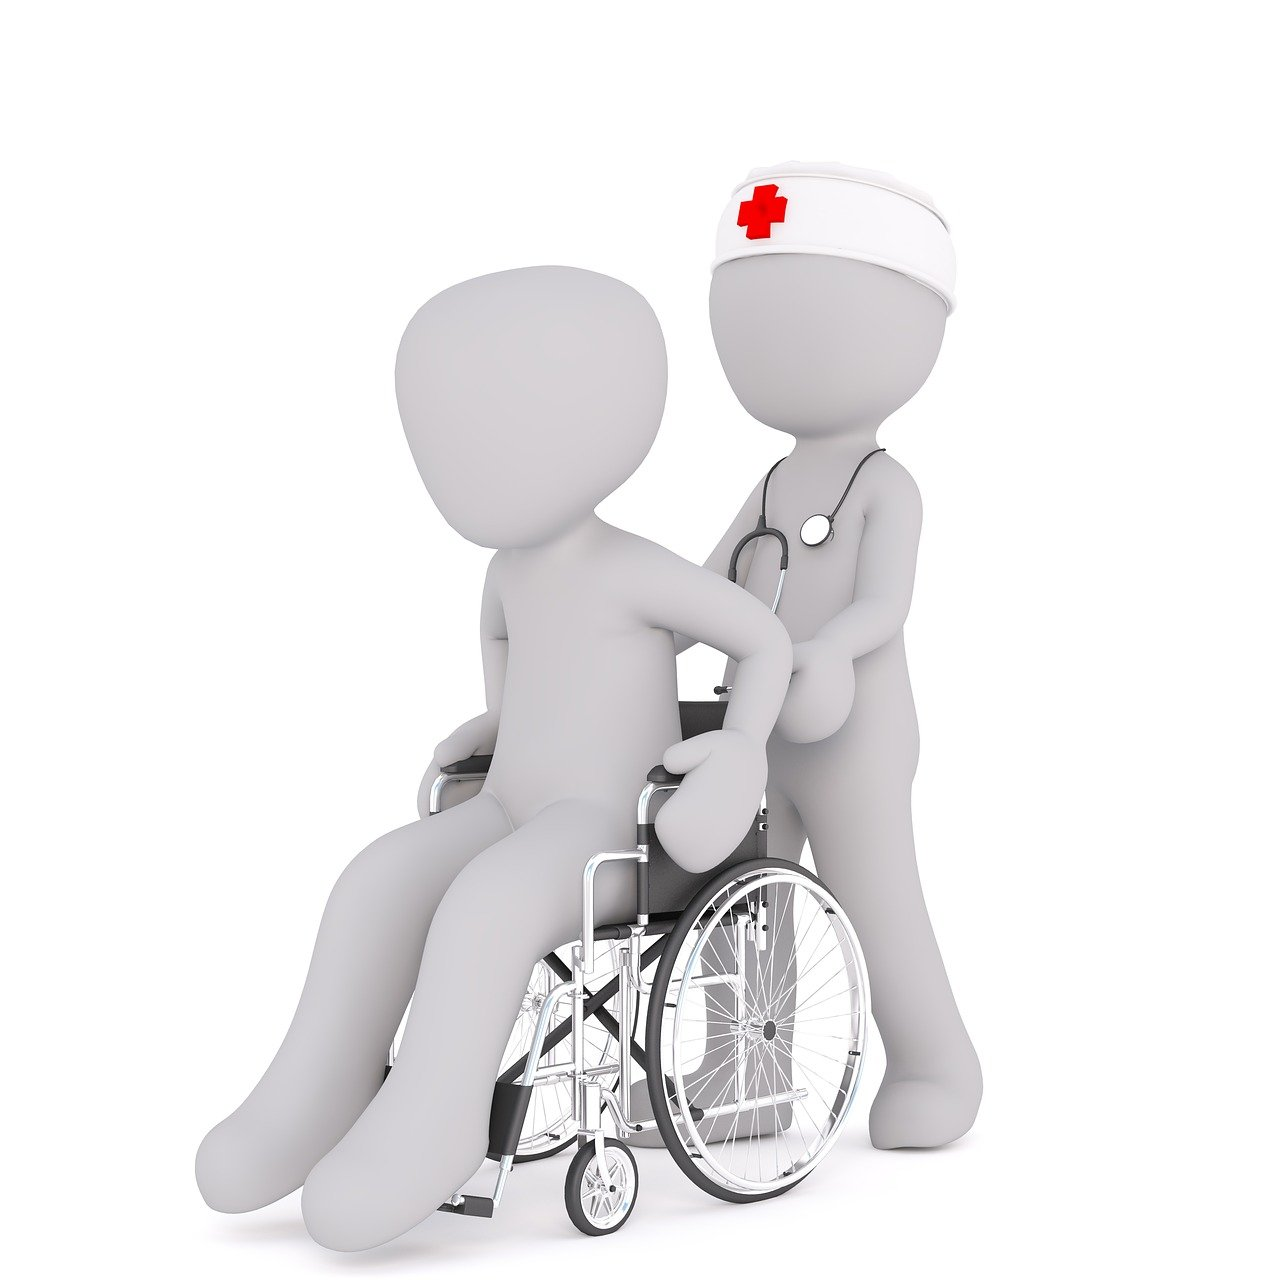 Huisartsenpraktijk Lievekamp dokterspost